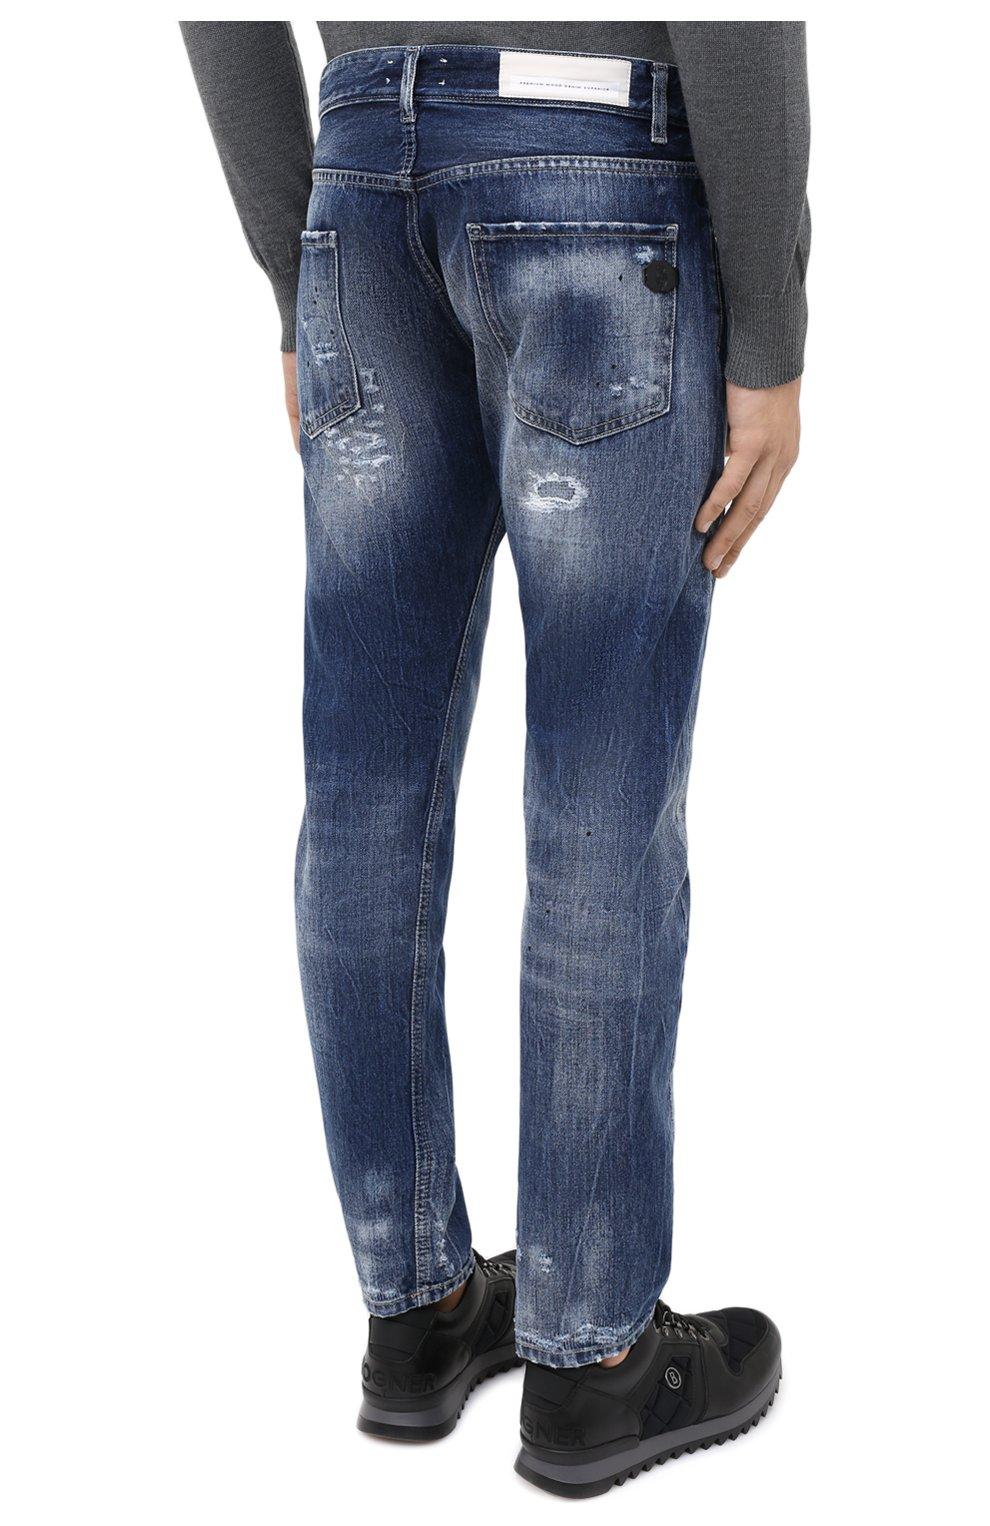 Мужские джинсы PREMIUM MOOD DENIM SUPERIOR синего цвета, арт. F21 352740221/BARRET   Фото 4